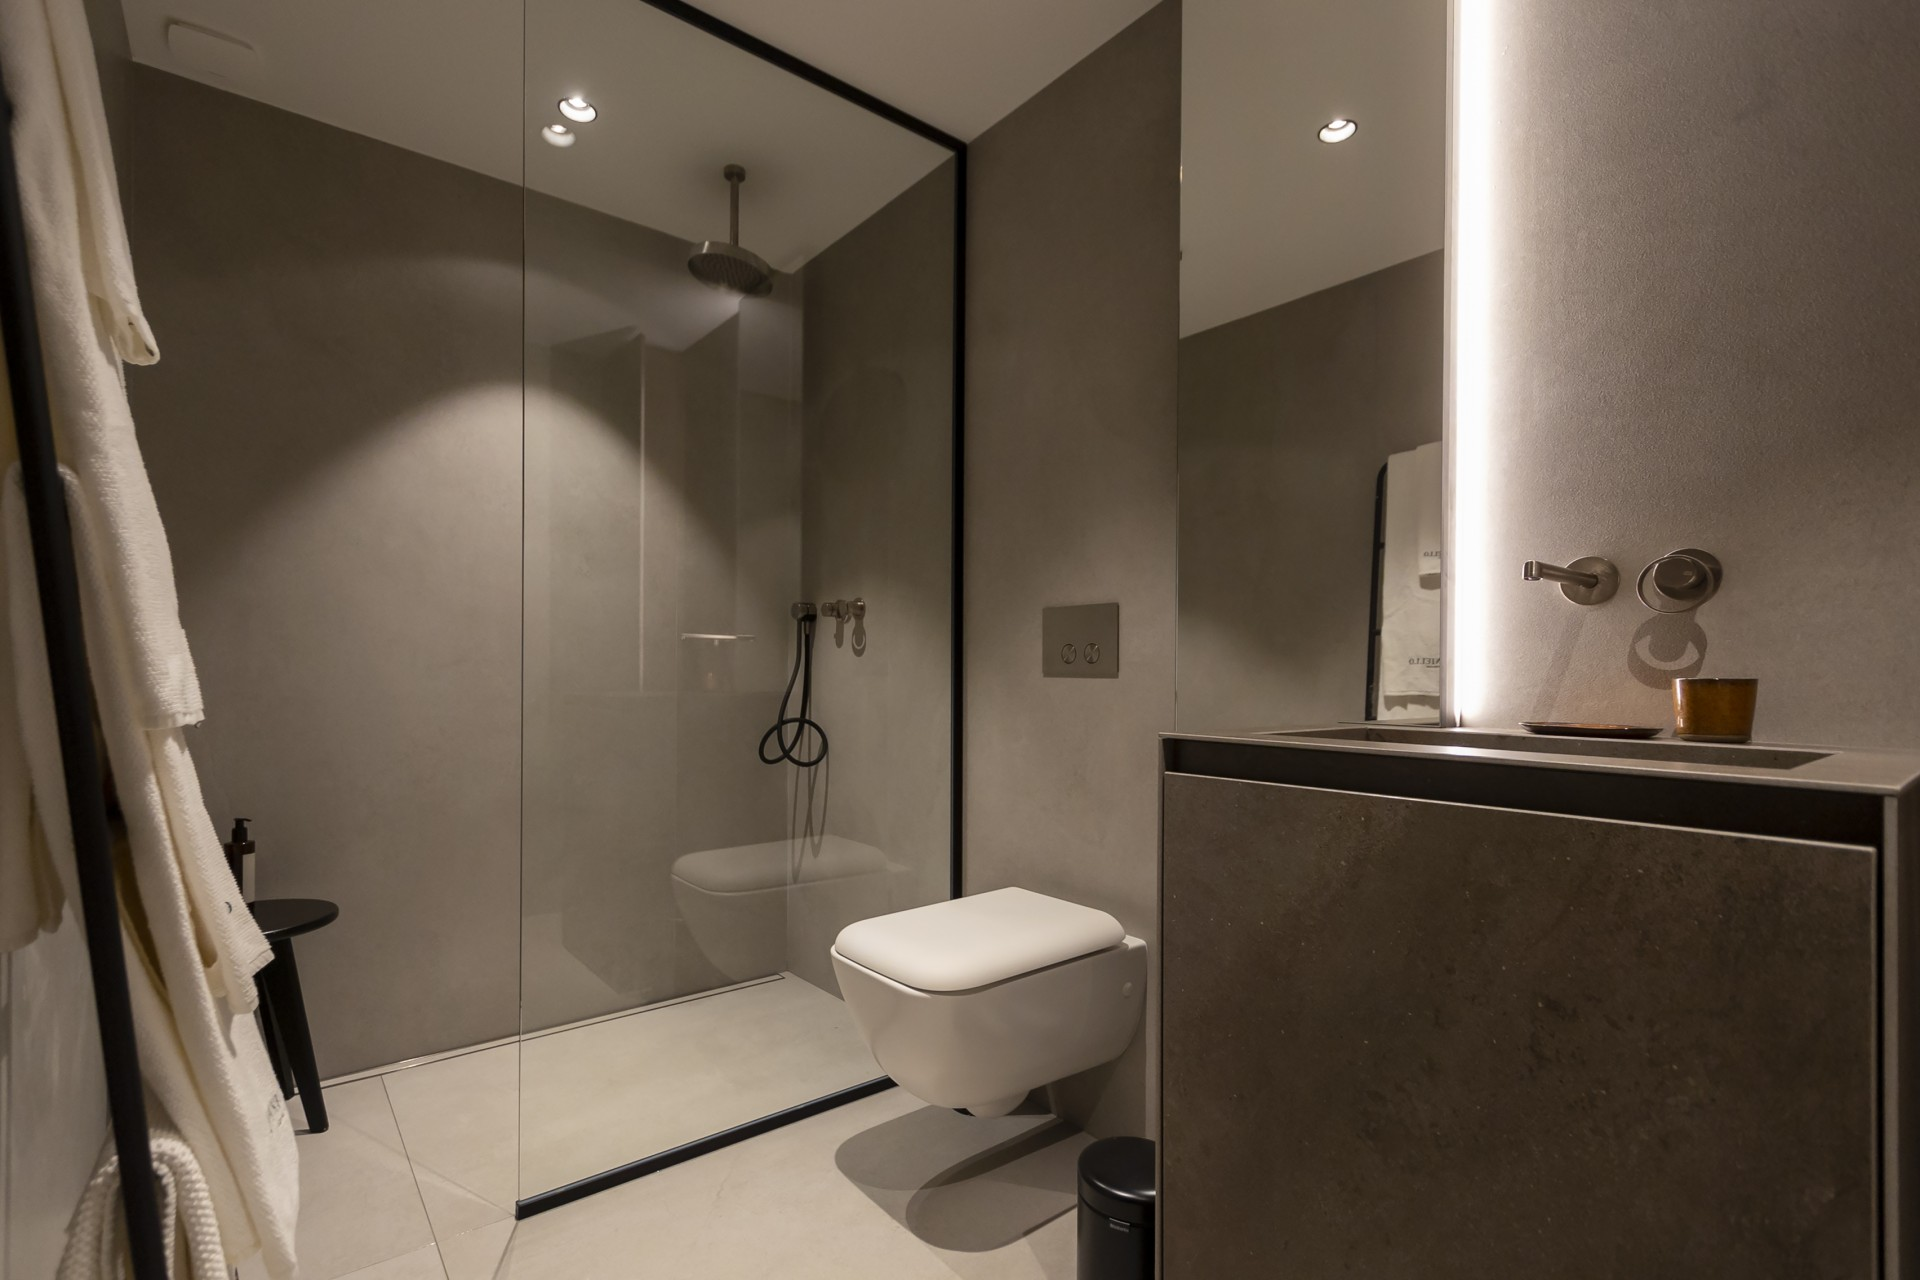 Propriano Luxury Rental Villa Pyrale Shower Room